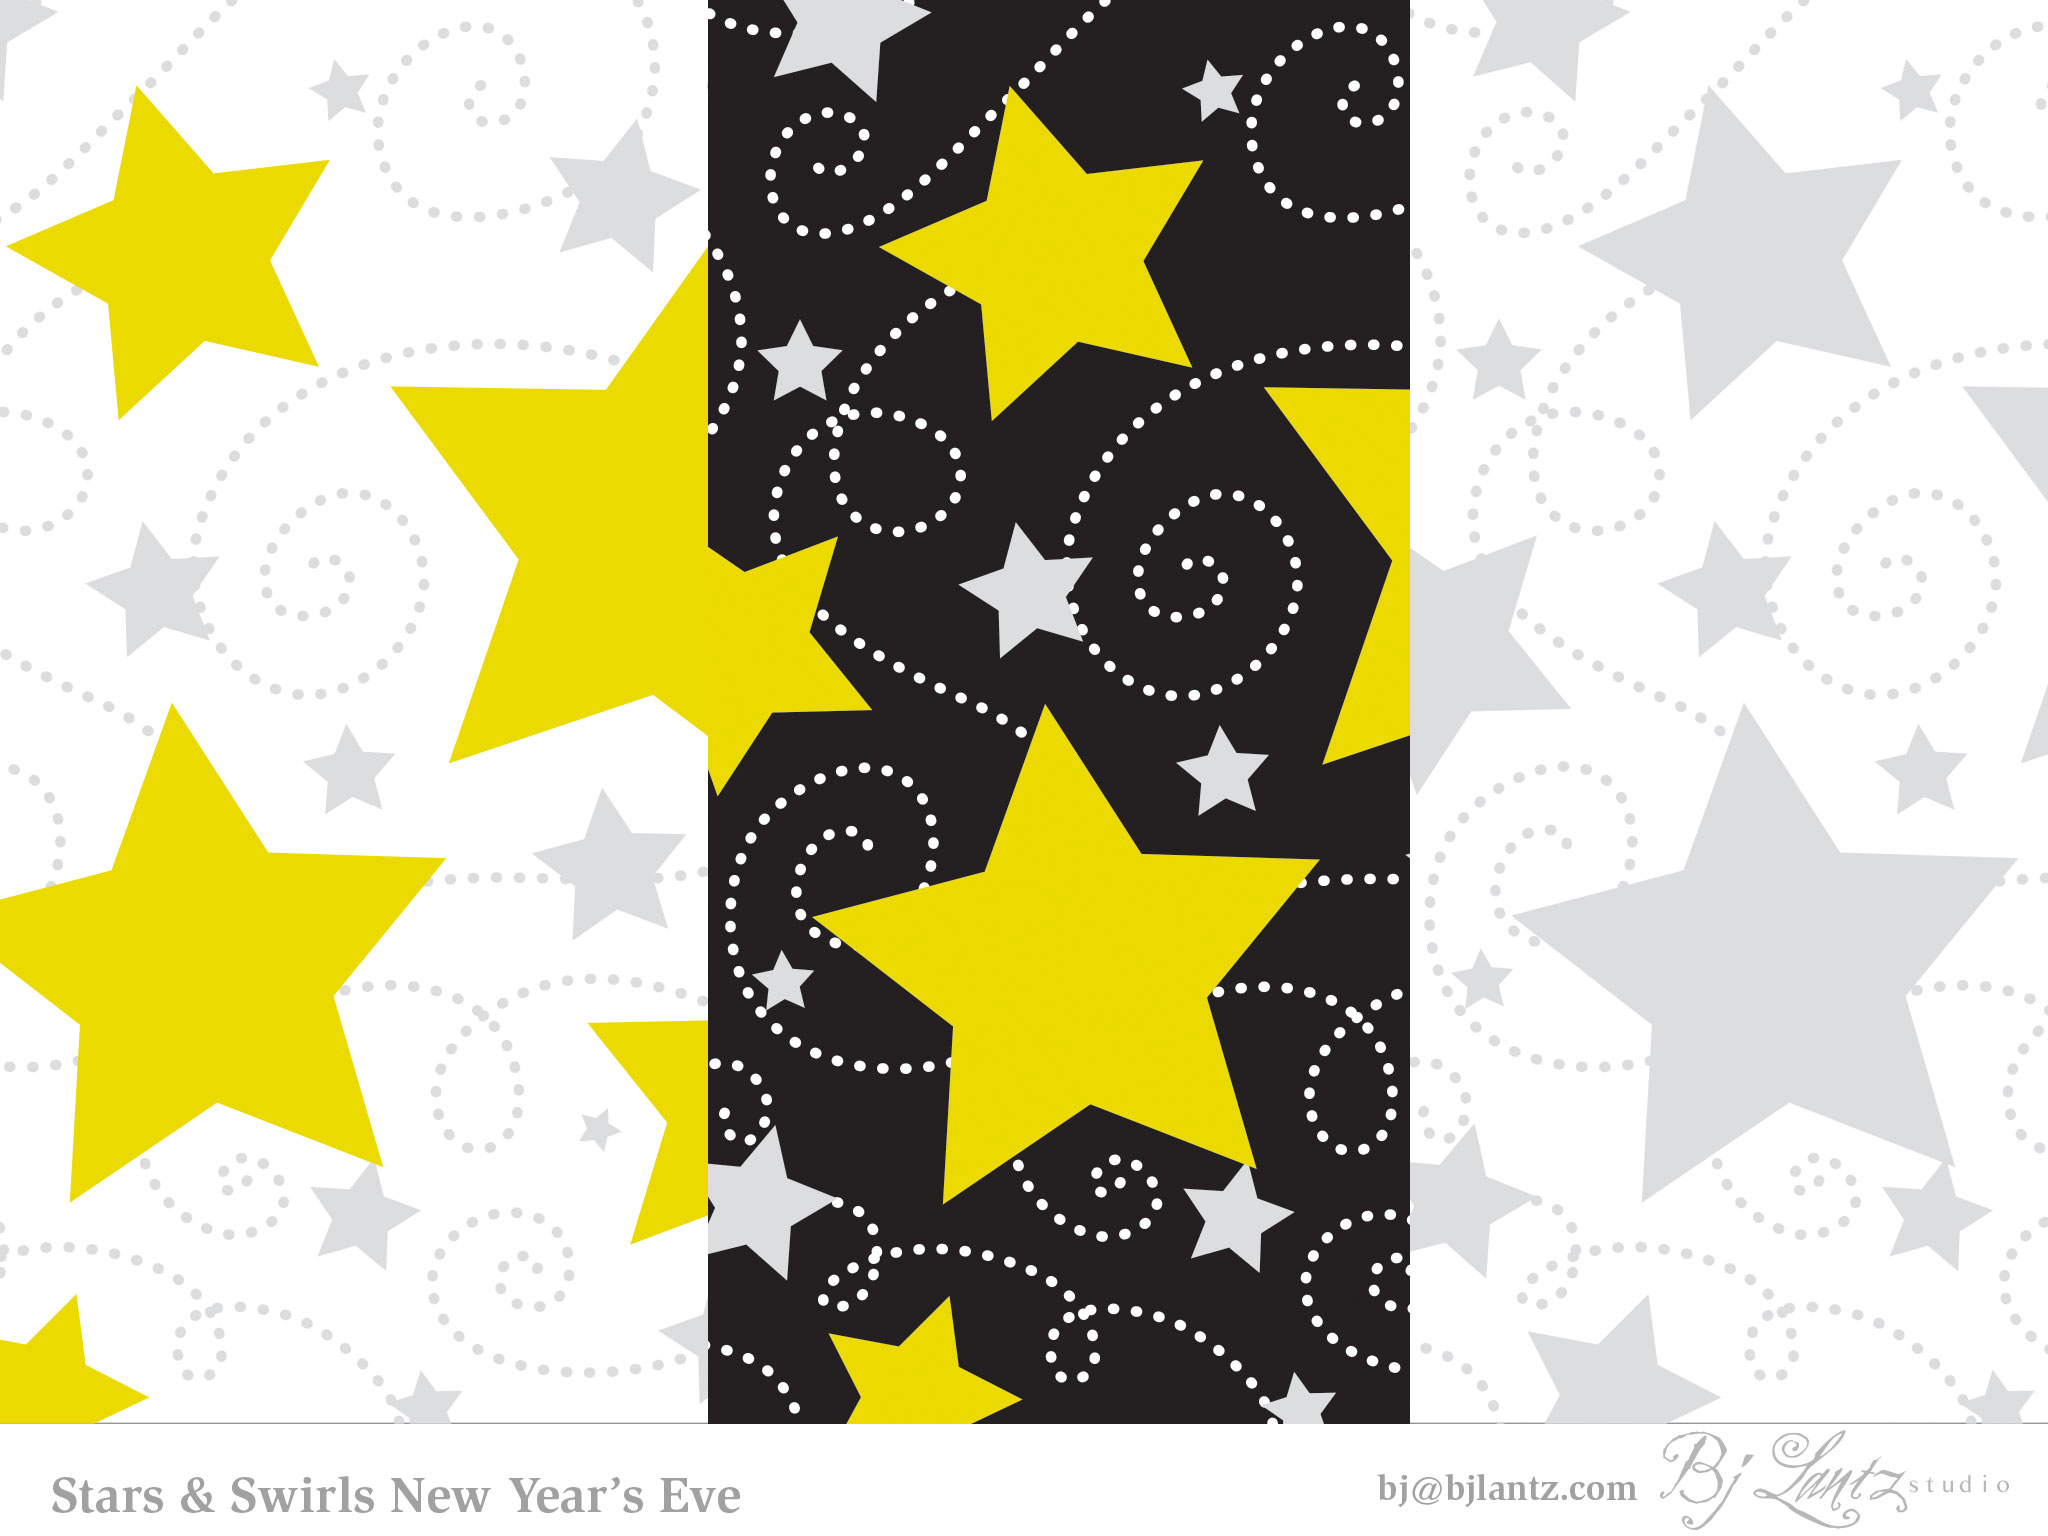 Stars-Swirls-BJ-Lantz_1.jpg